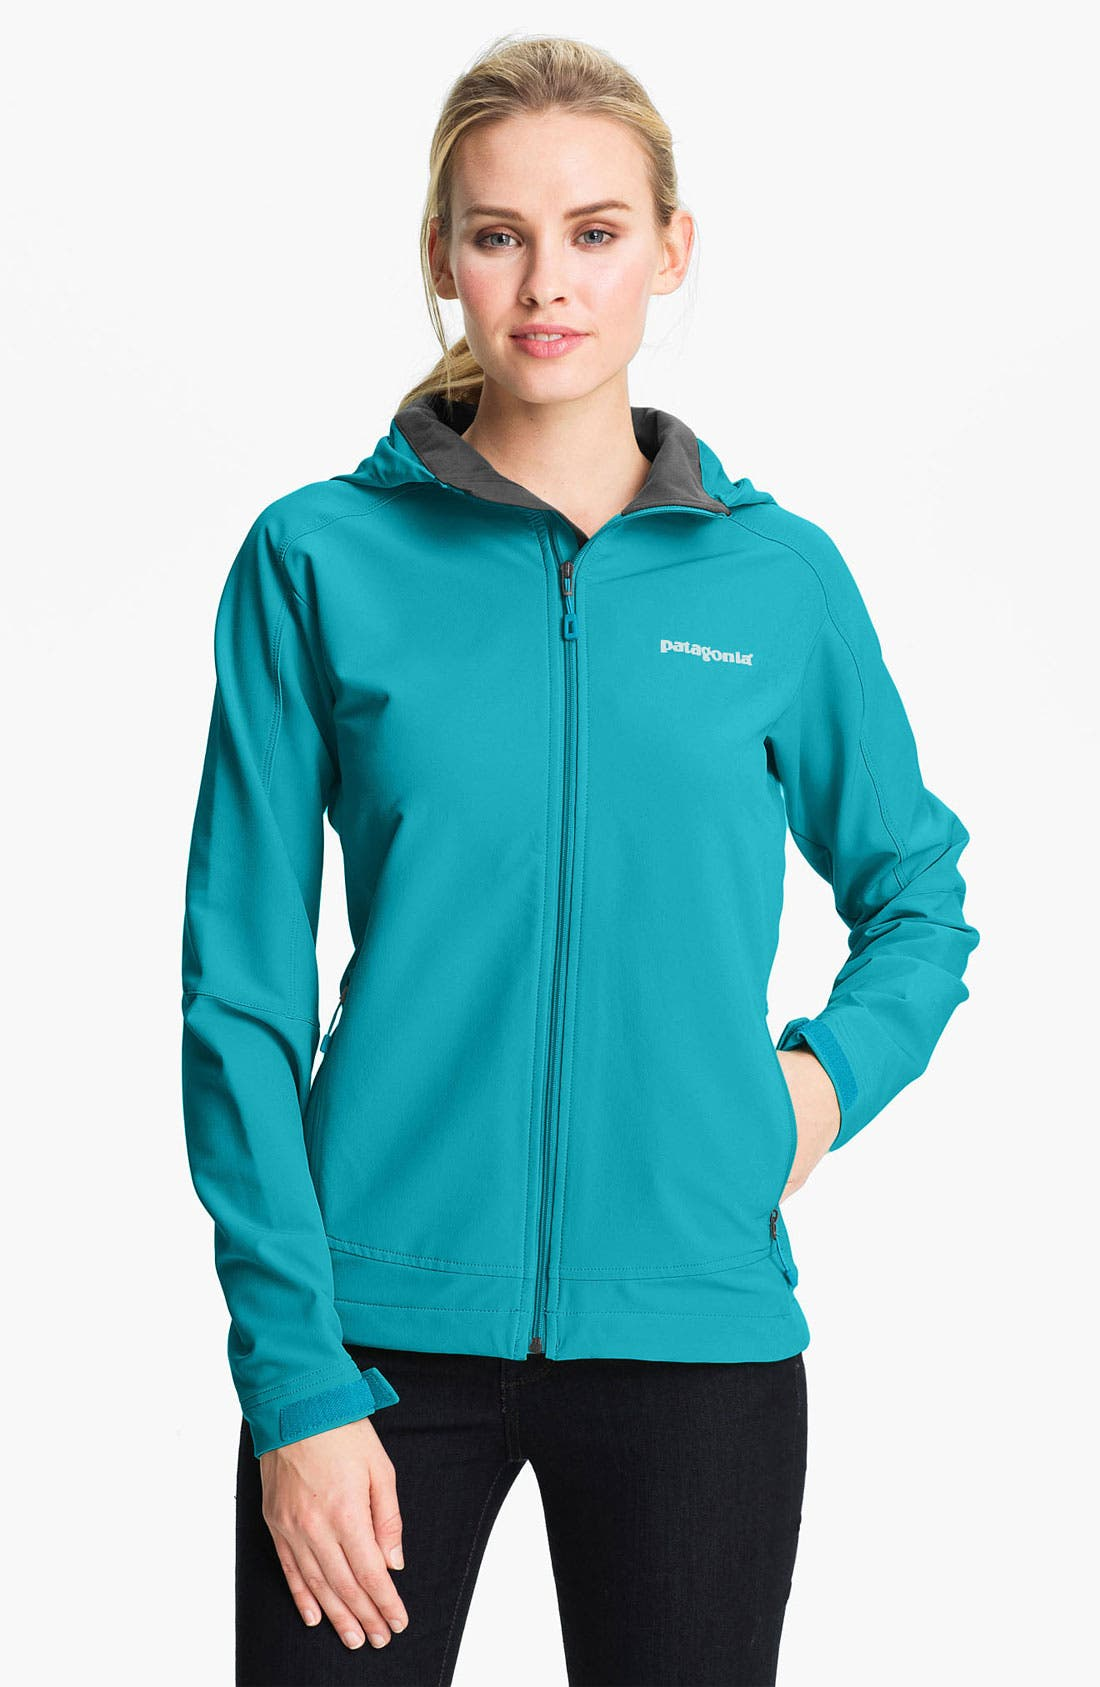 Alternate Image 1 Selected - Patagonia 'Simple Guide' Hooded Jacket